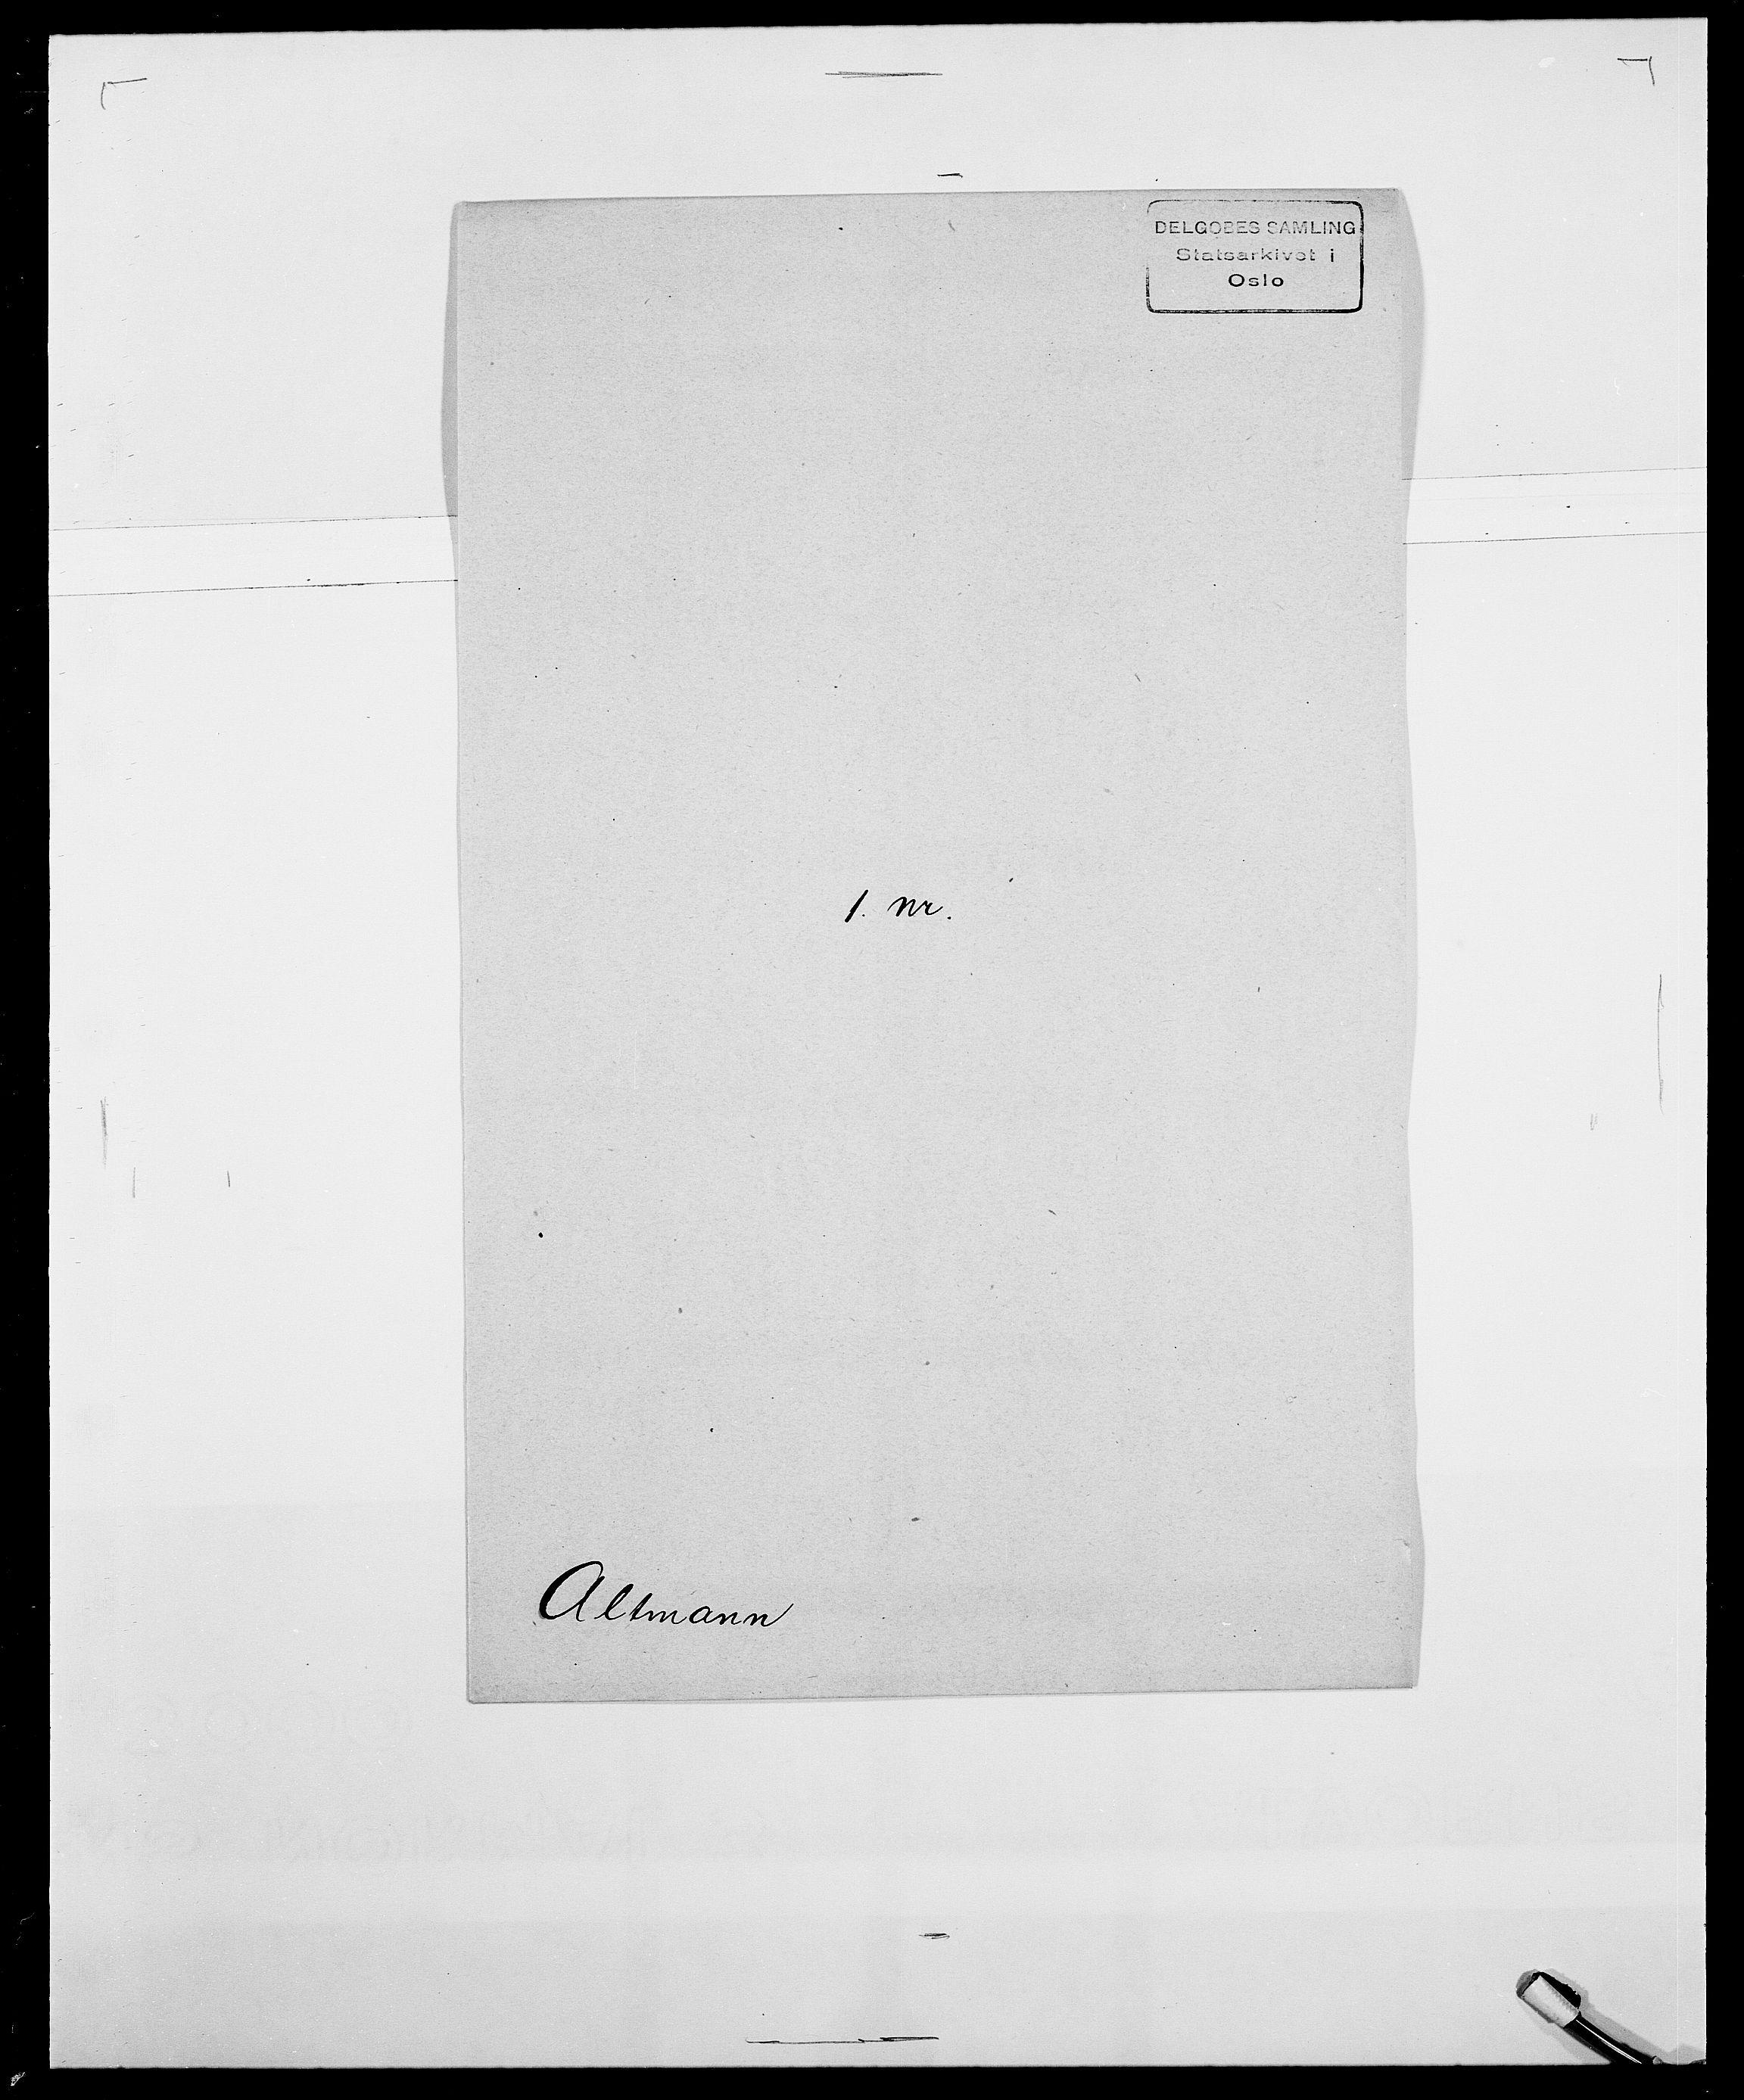 SAO, Delgobe, Charles Antoine - samling, D/Da/L0001: Aabye - Angerman, s. 501